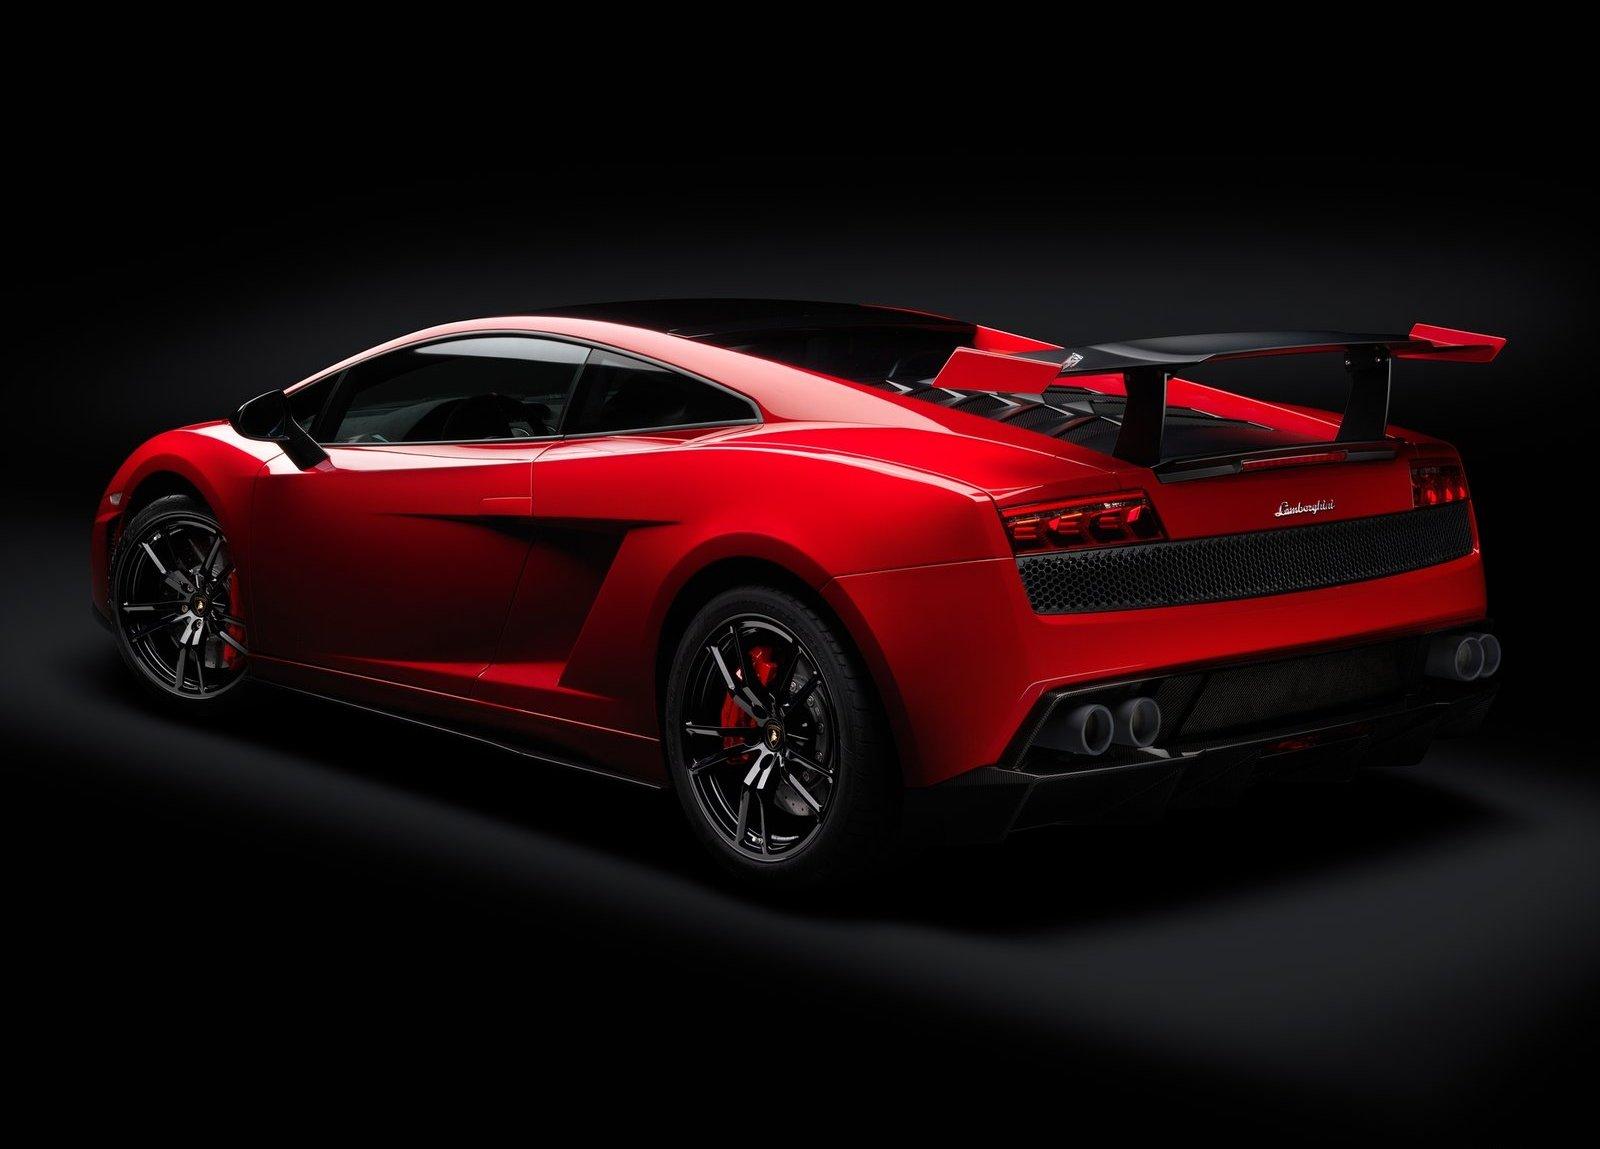 Lamborghini Gallardo Trofeo Stradale Red Black Beast Car Wallpaper